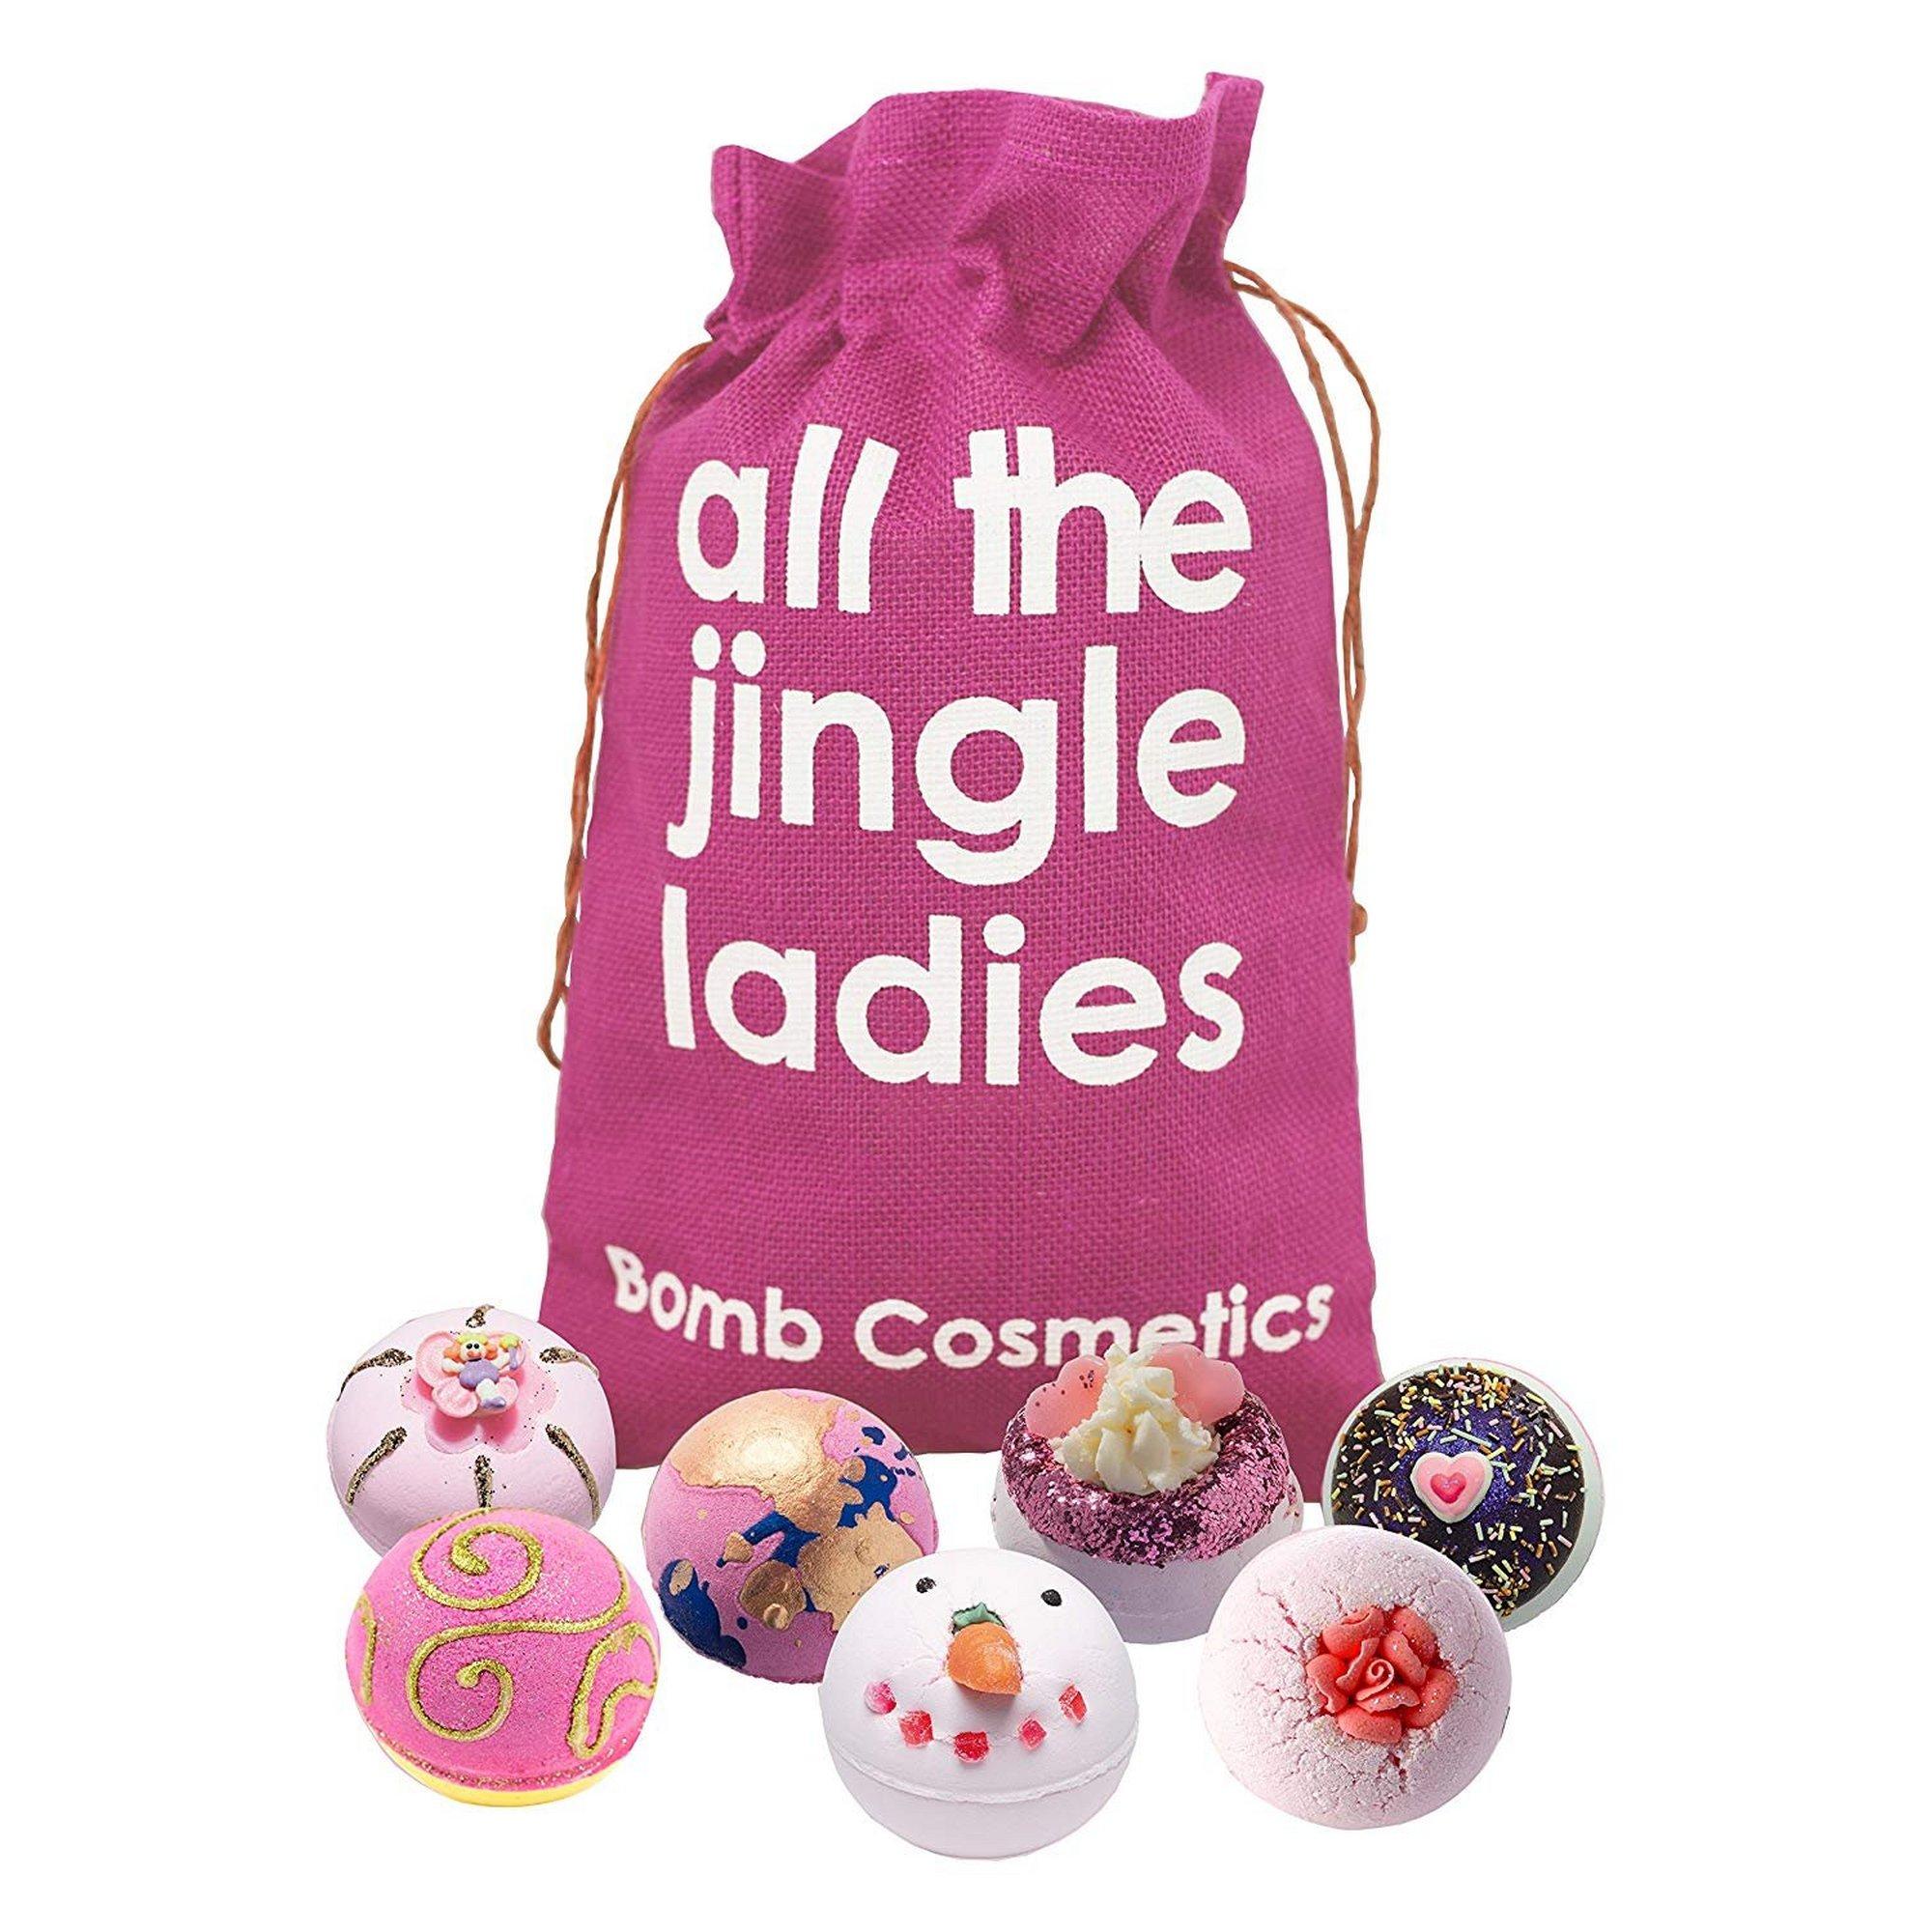 Image of Bomb Cosmetics All the Jingle Ladies Sack